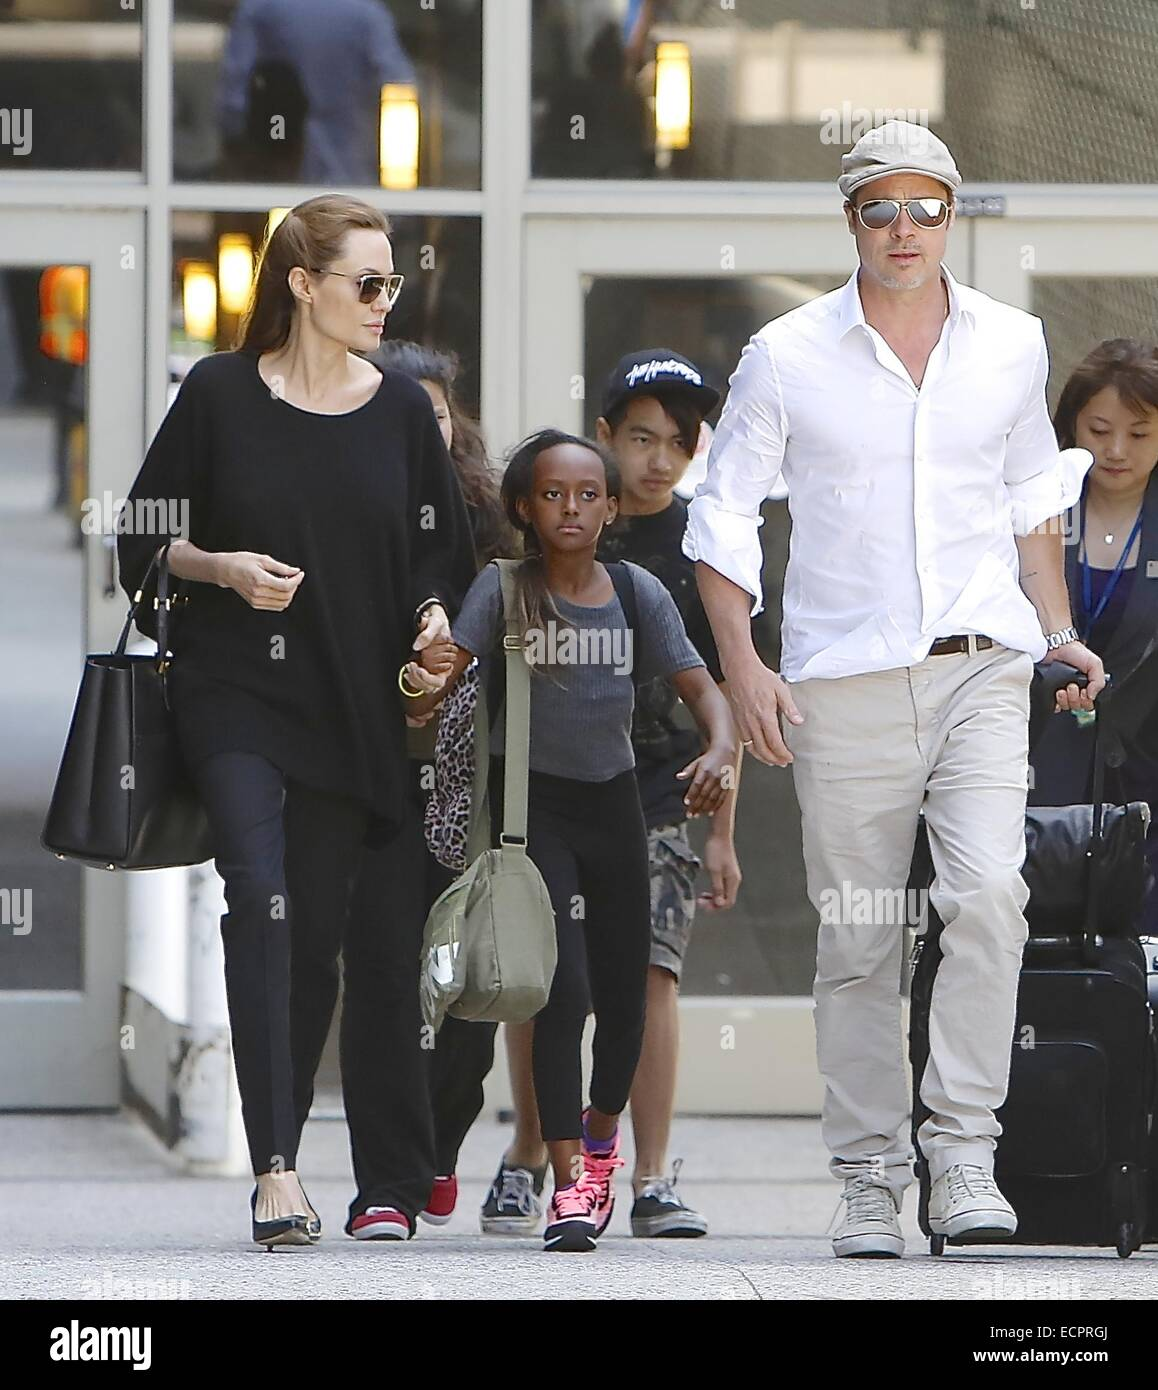 Brad Pitt e Angelina Jolie arriva a Los Angeles International (LAX) aeroporto con i loro figli Maddox e Zahara dotate: Immagini Stock